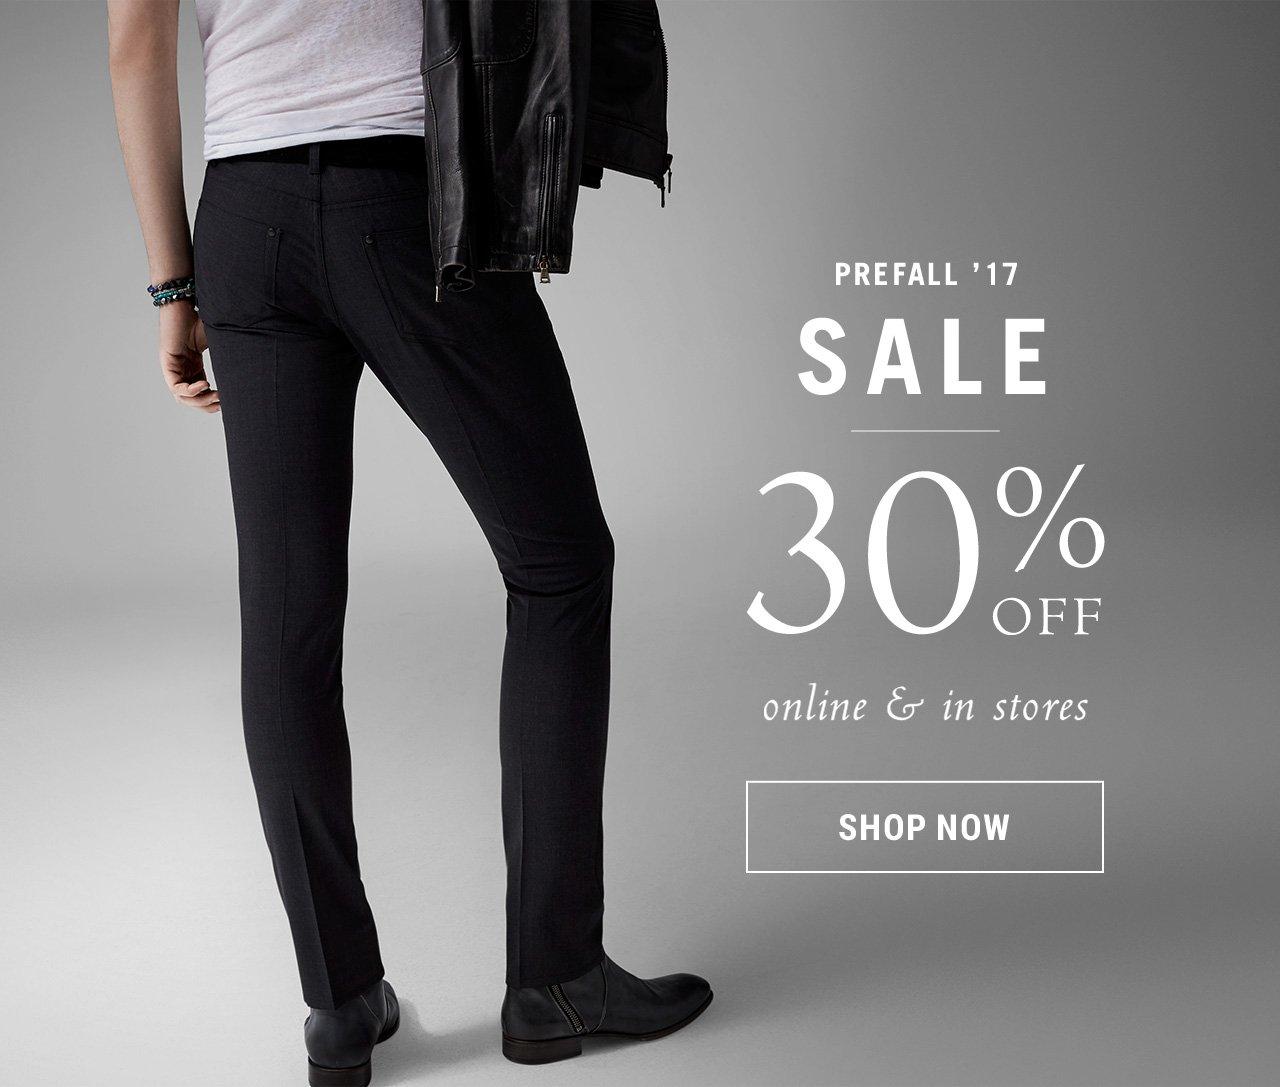 Prefall '17 sale - 30% off. Shop now!